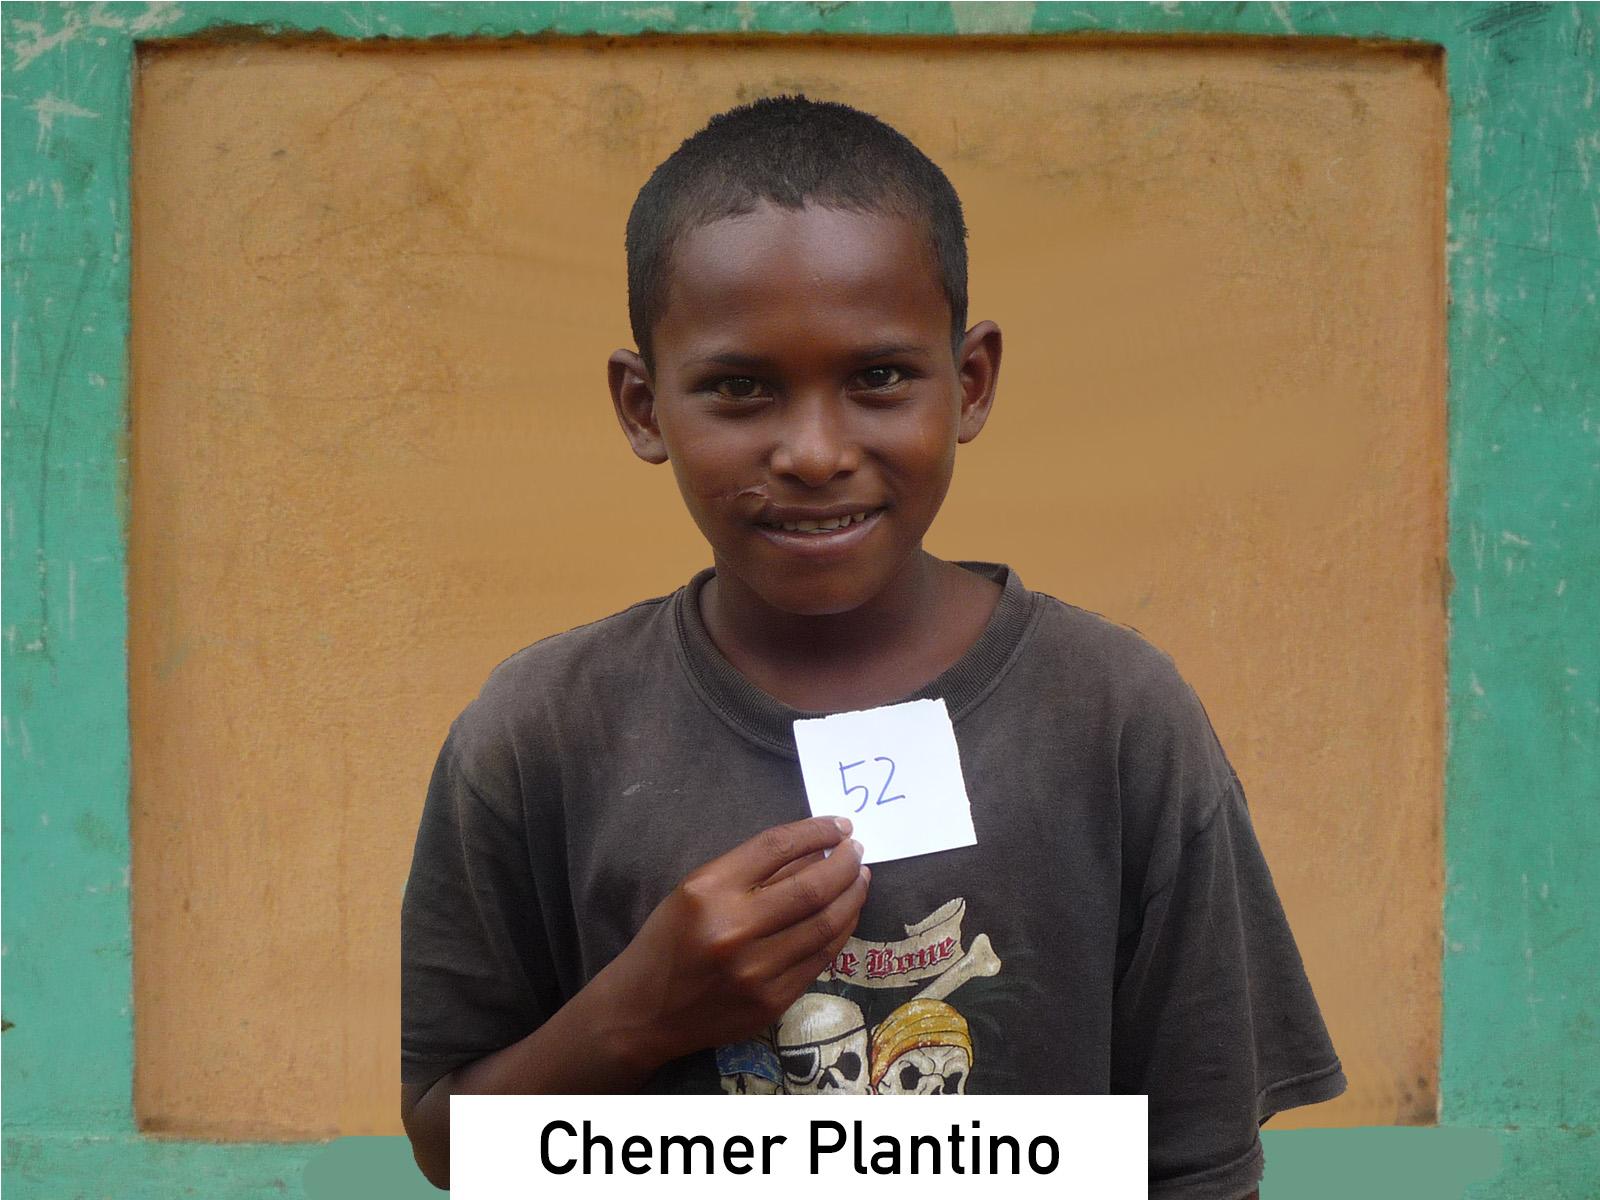 052 - Chemer Plantino.jpg